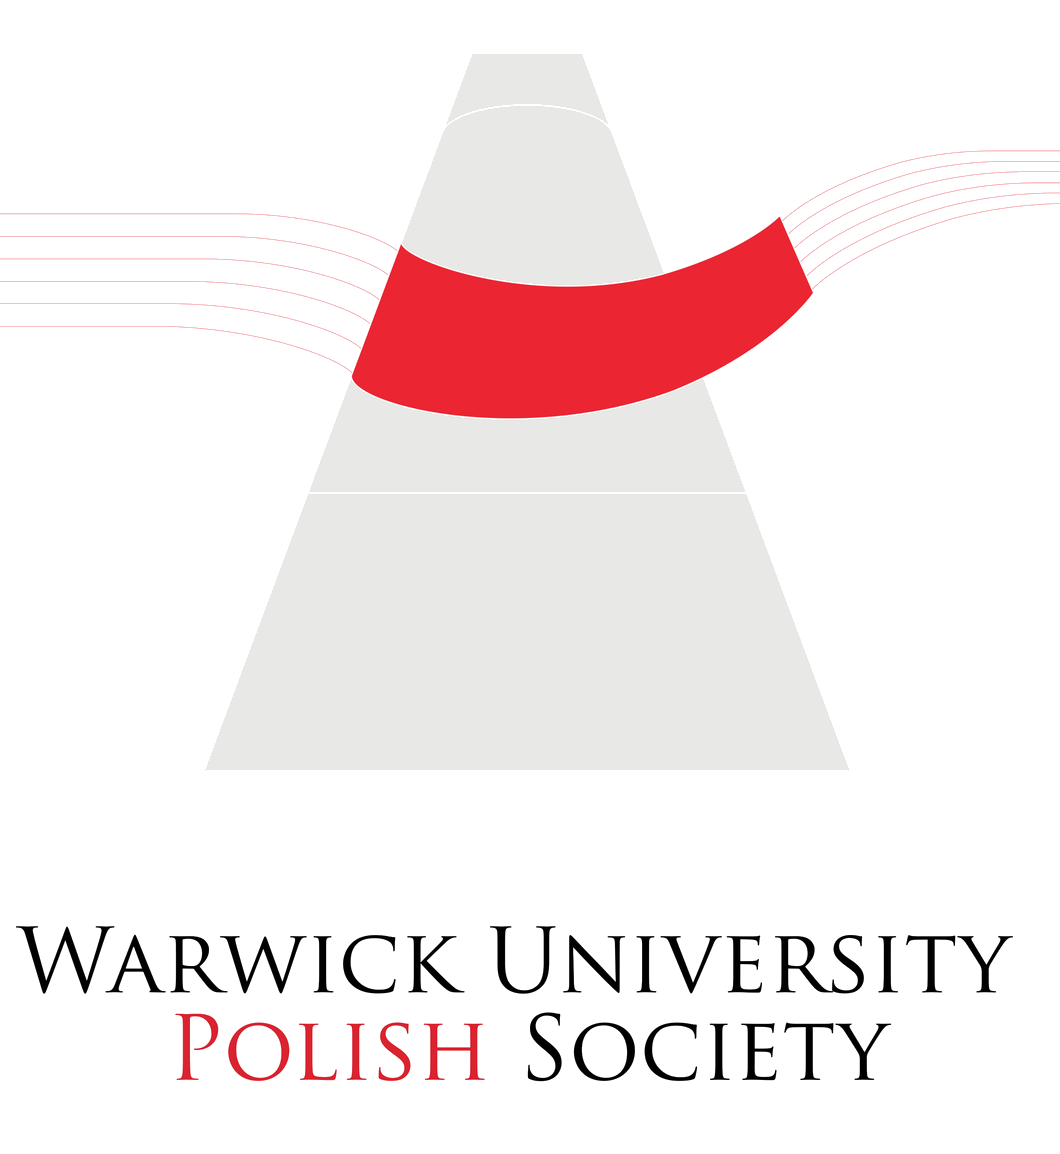 Warwick University Polish Society